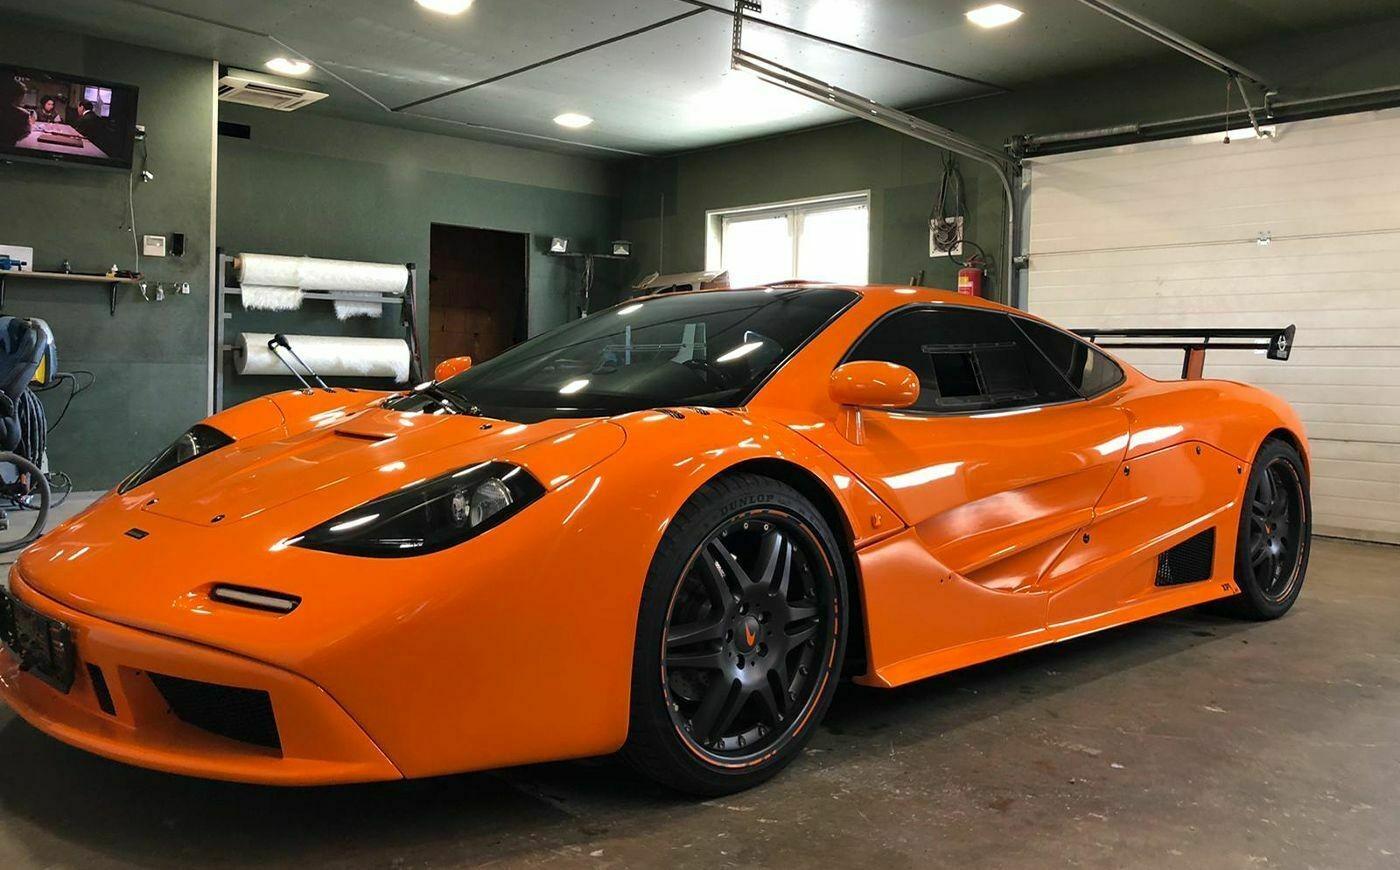 Неплохая реплика McLaren F1, созданная на базе Porsche Boxster